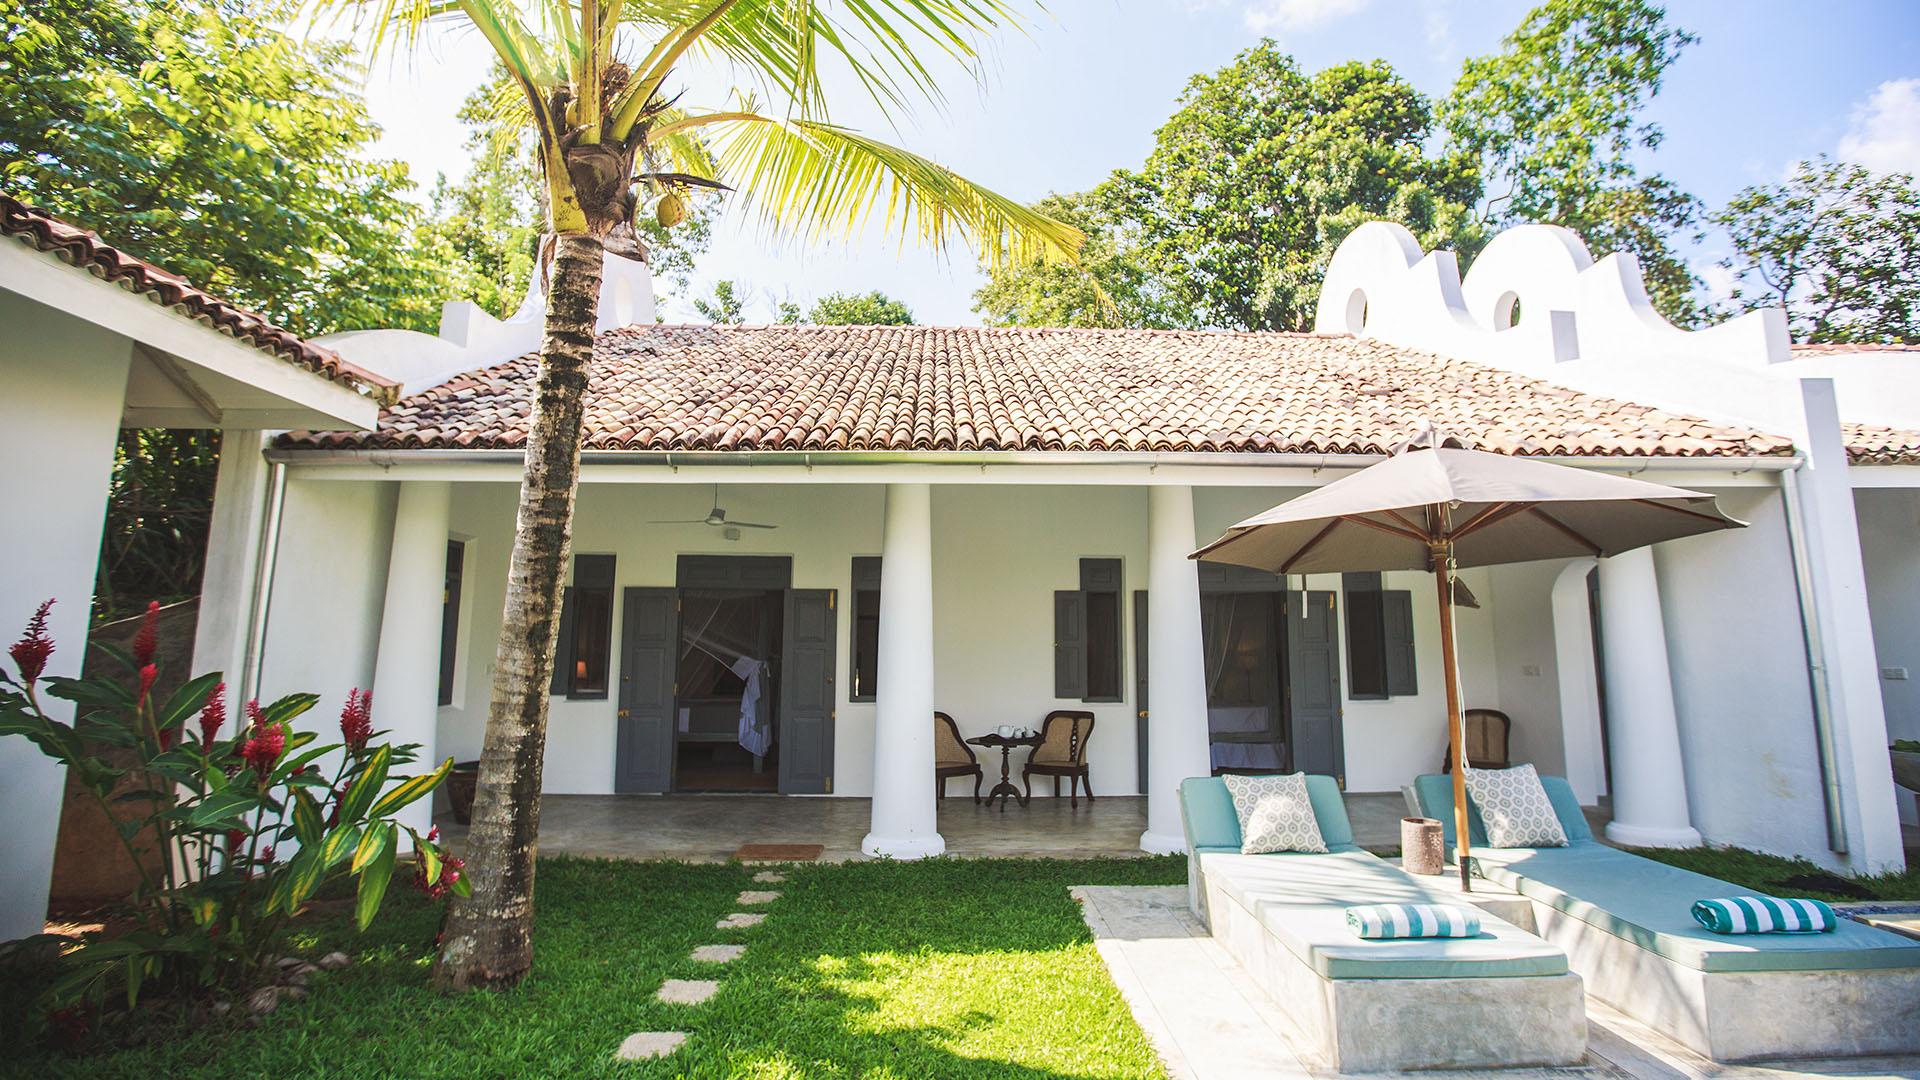 Sri_lanka_holiday_villa_sissila_general_Sri_lanka_holiday_villa_sissila_general_01.jpg